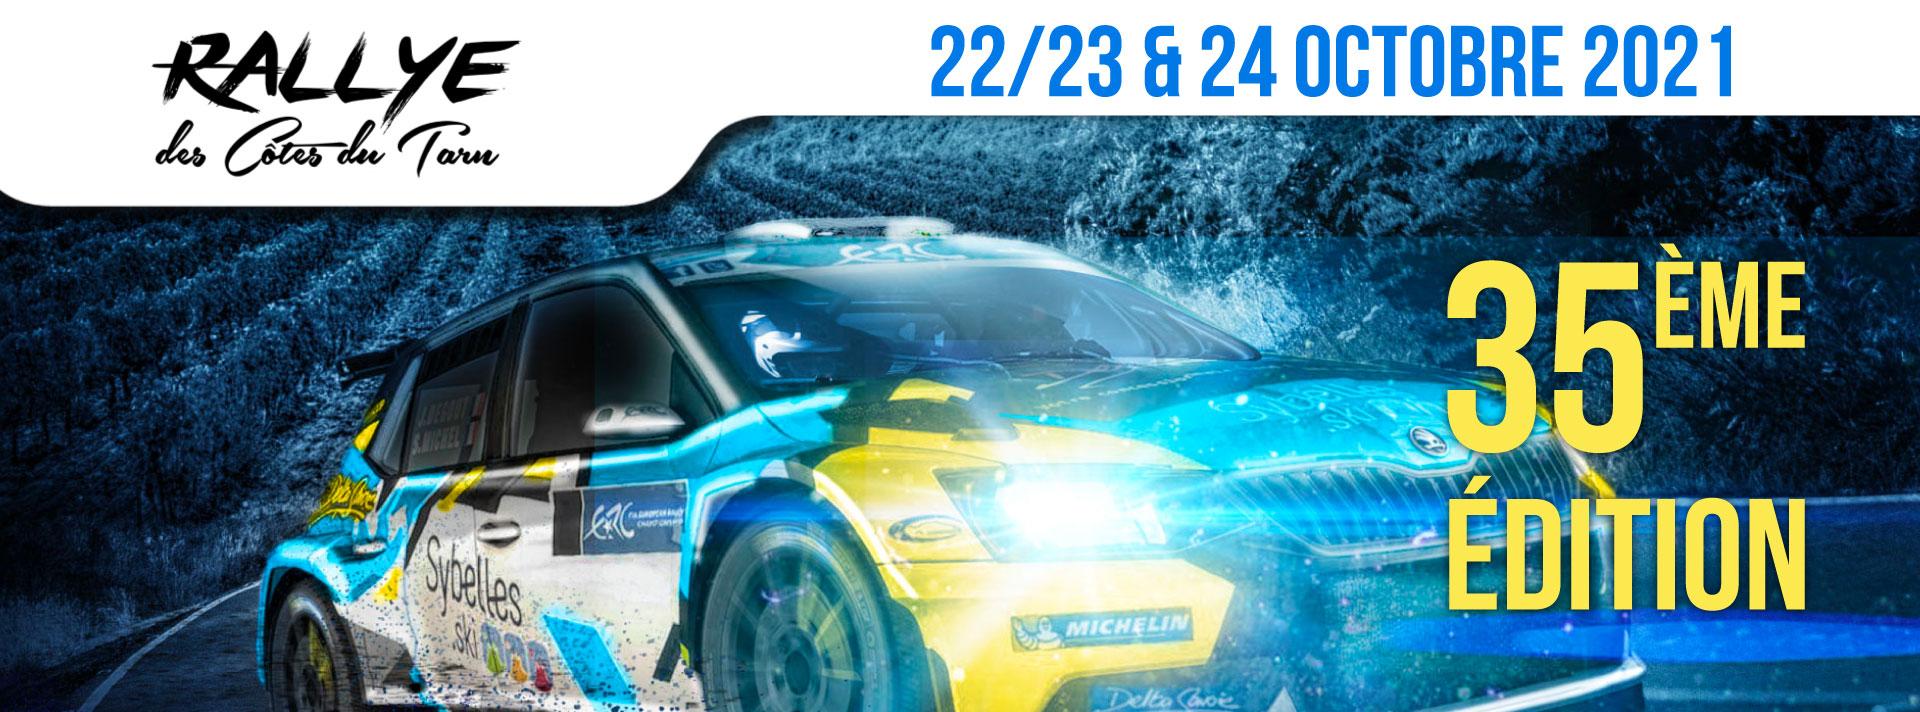 https://www.rallyedescotesdutarn.com/wp-content/uploads/2021/07/rallye-cotes-du-tarn-2021.jpg